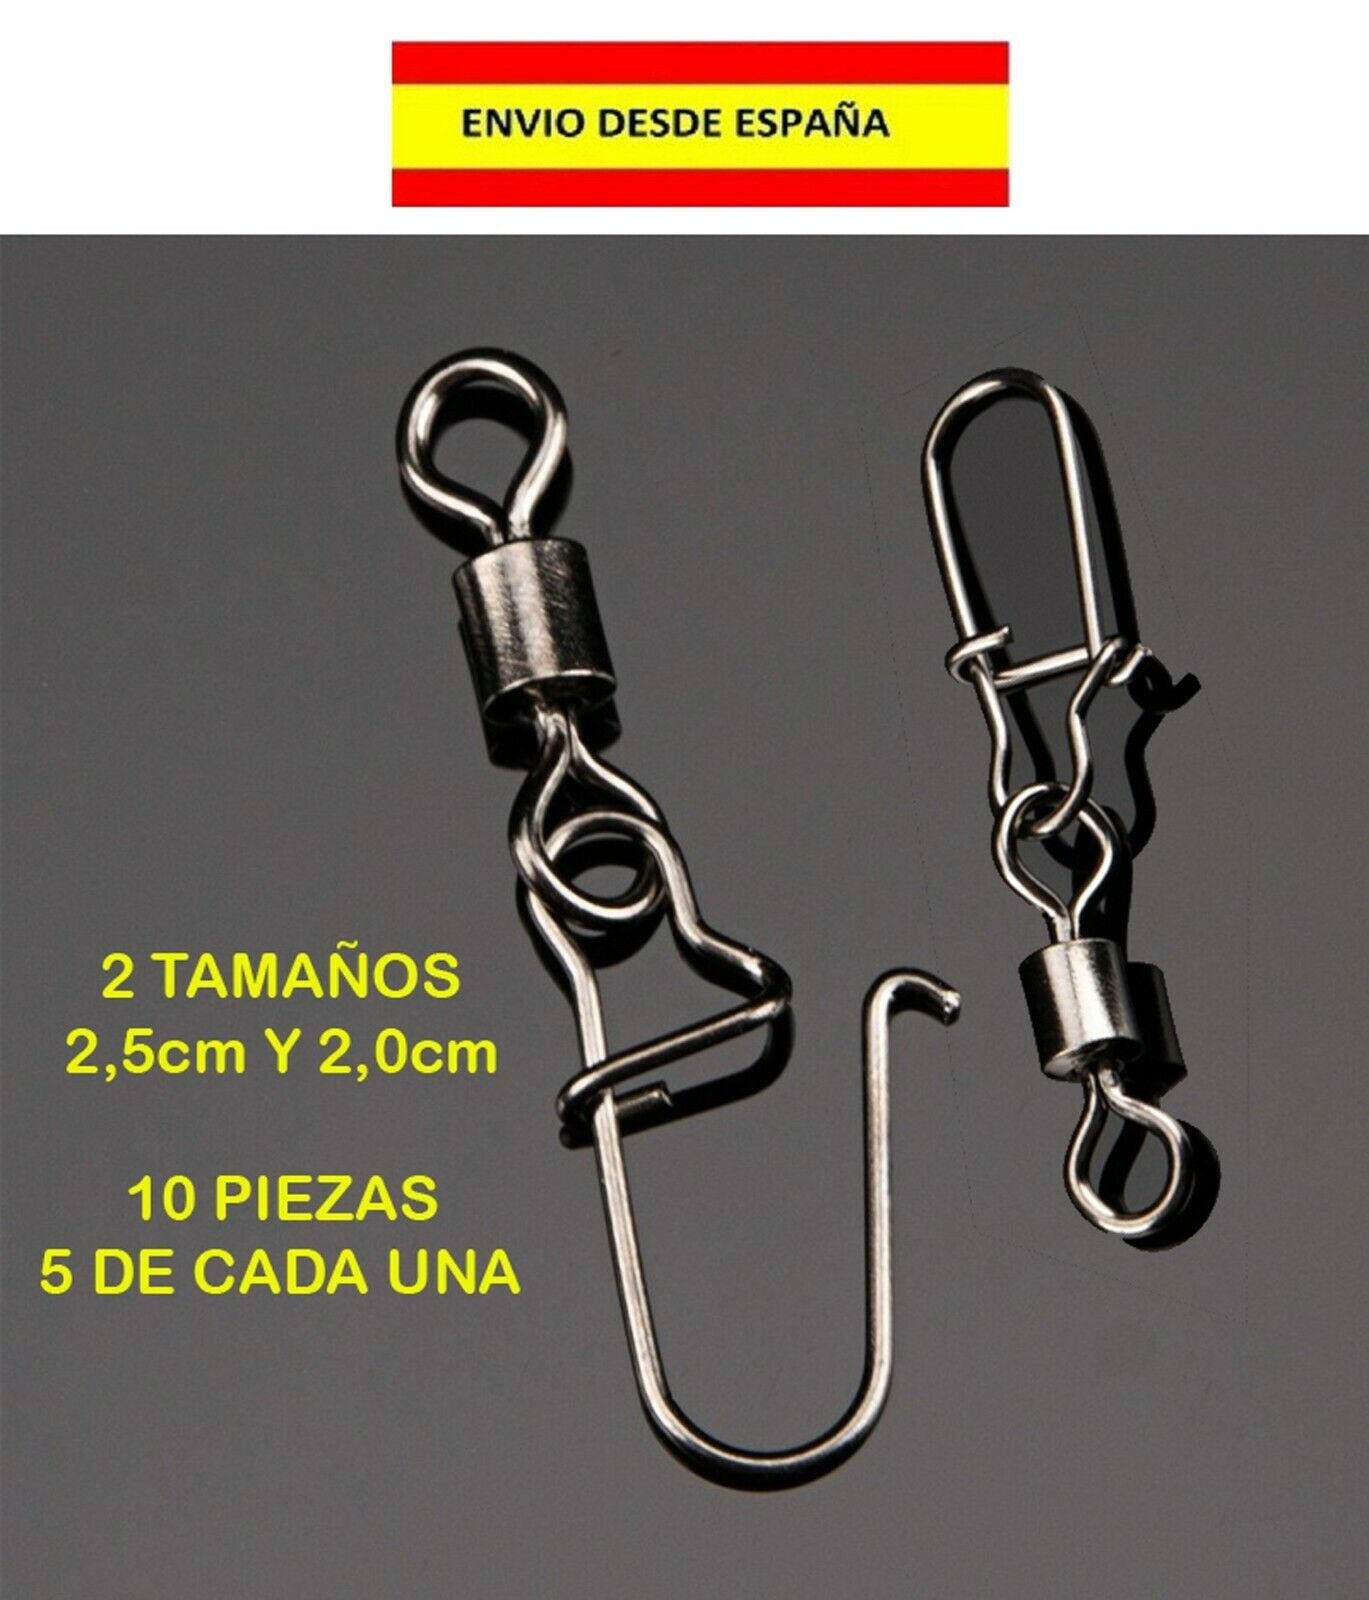 10 BAJOS DE LÍNEA CÁNCAMO ALFILER GANCHO ANZUELO PESCA CEBO CARNADA MAR...